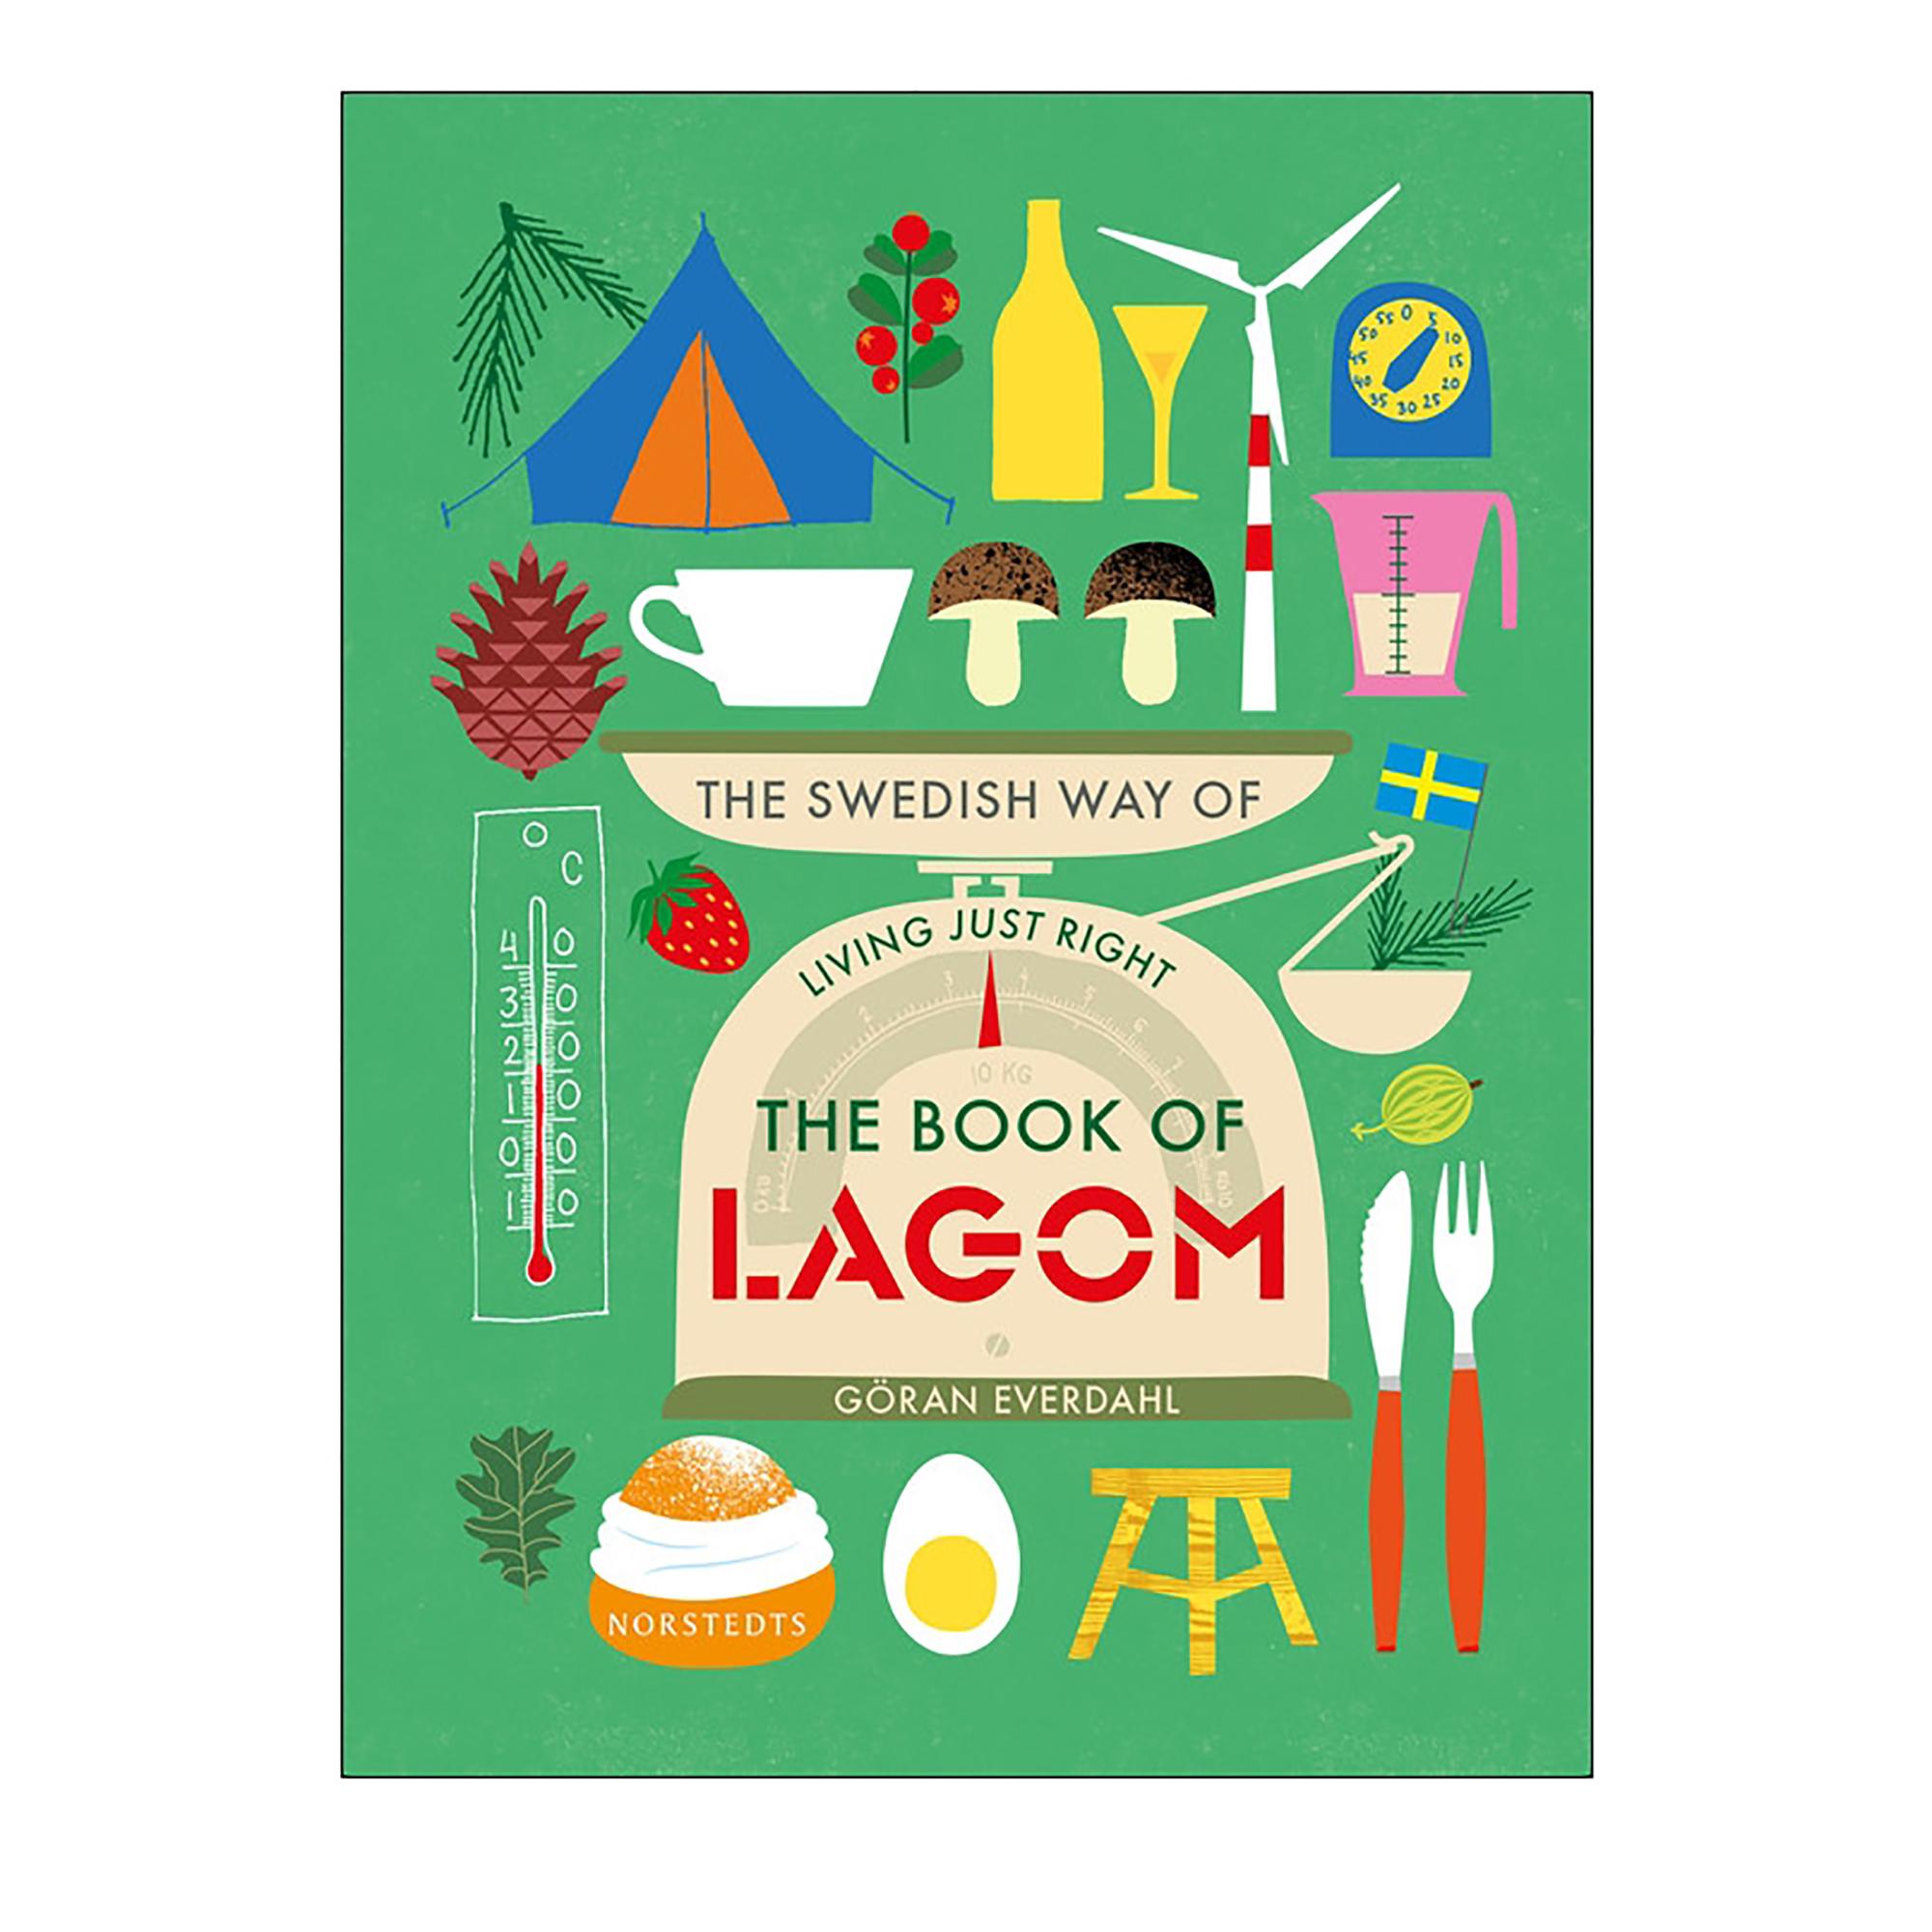 Designtorget Bok The Book of Lagom